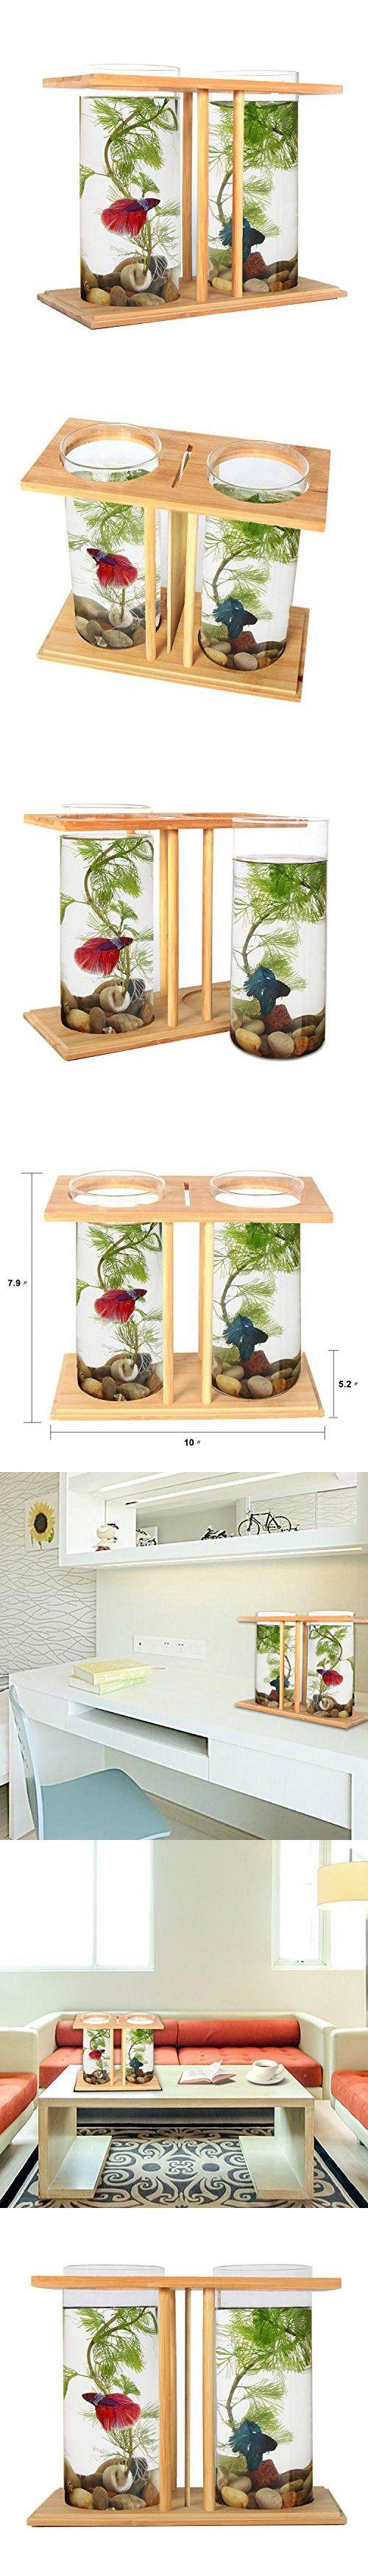 Best 25 square glass vase ideas on pinterest square vase fish bowls bamboosegarty unique cool design small square glass vase creative aquarium kit with reviewsmspy